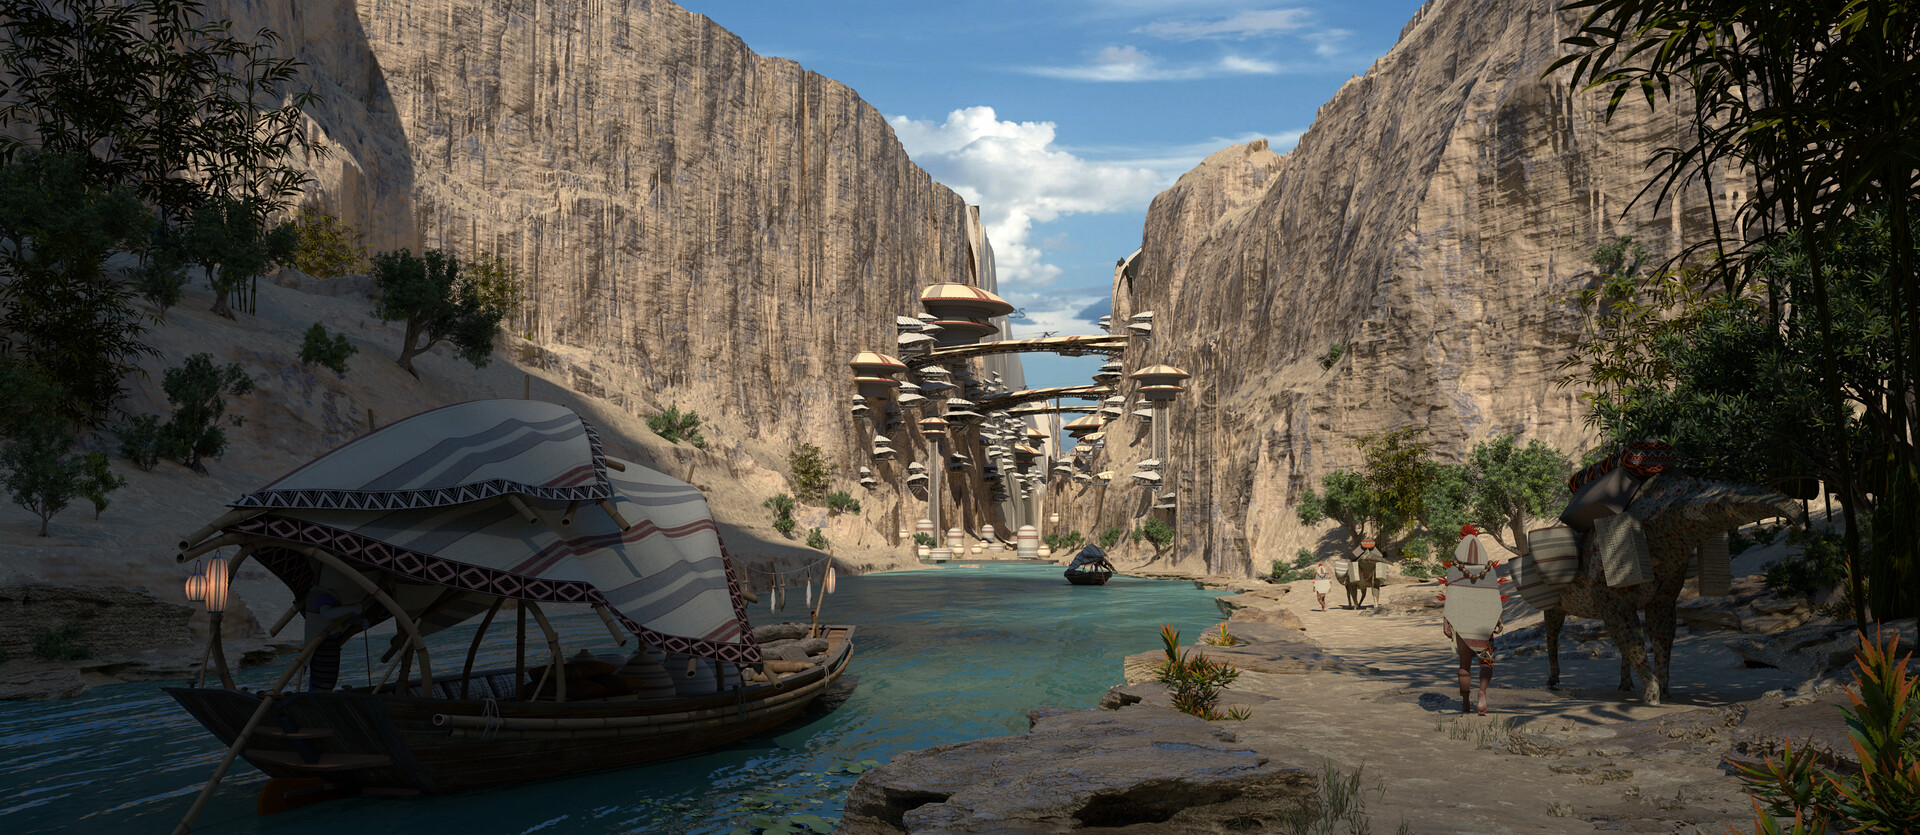 Jordi van hees canyon city rendering 000 small